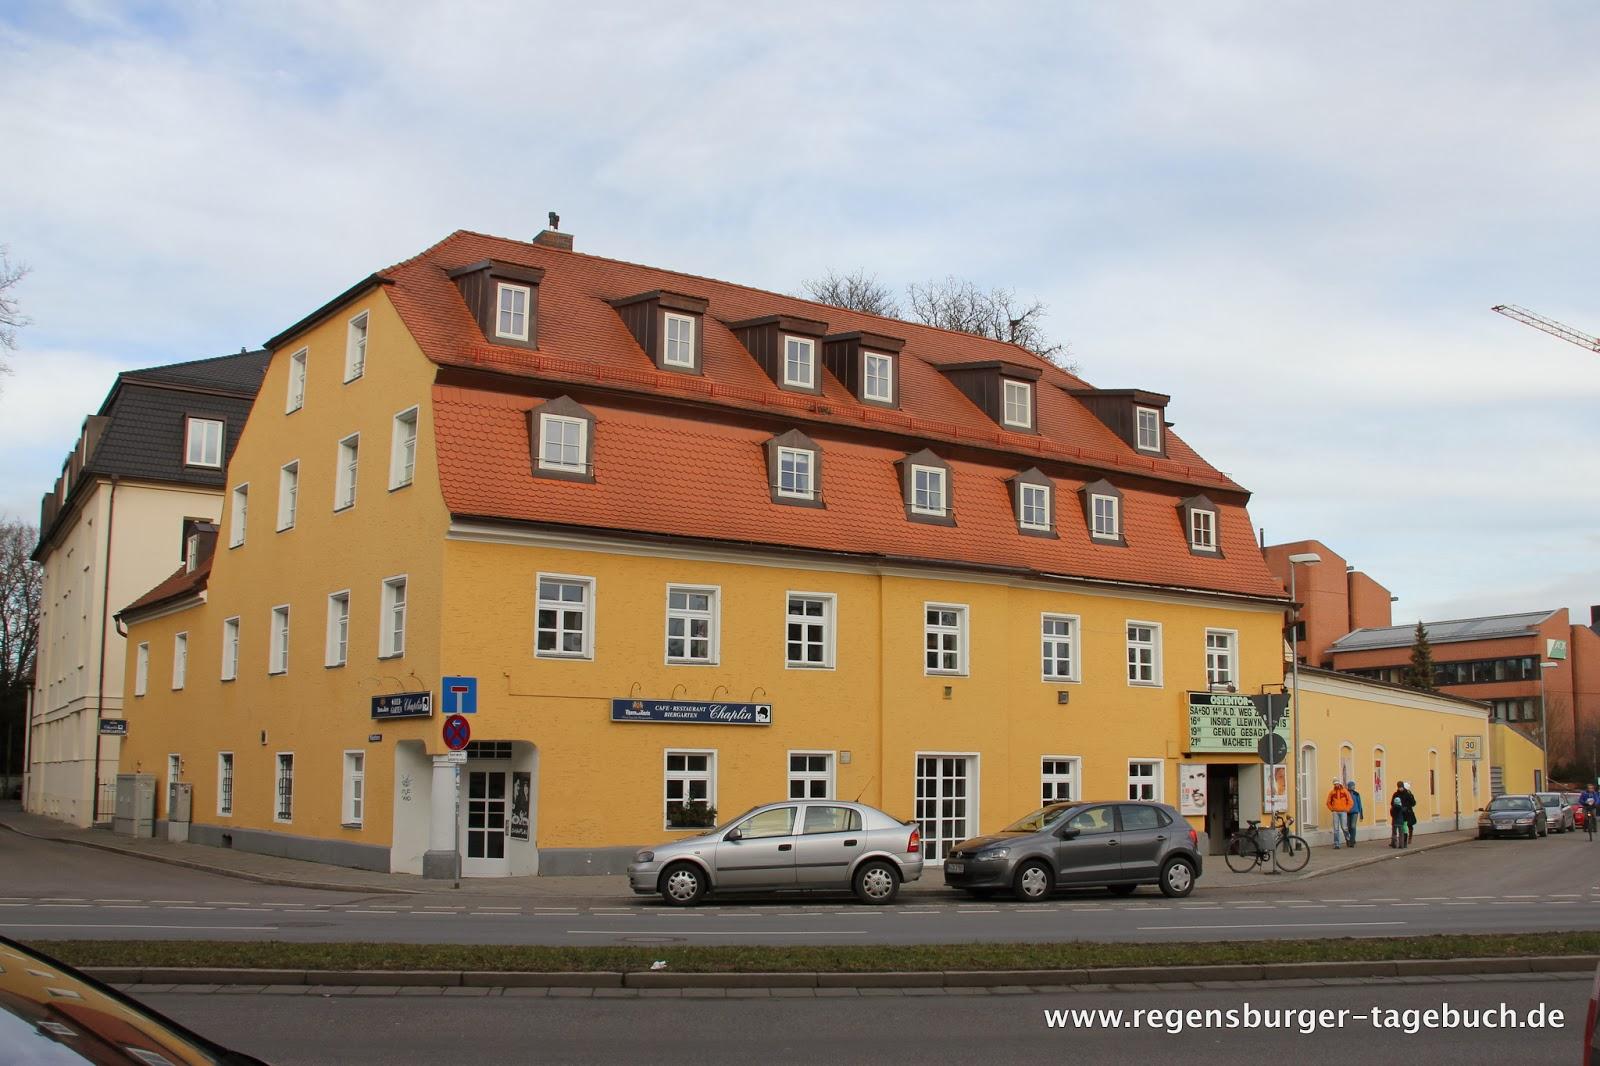 Ostentorkino Regensburg